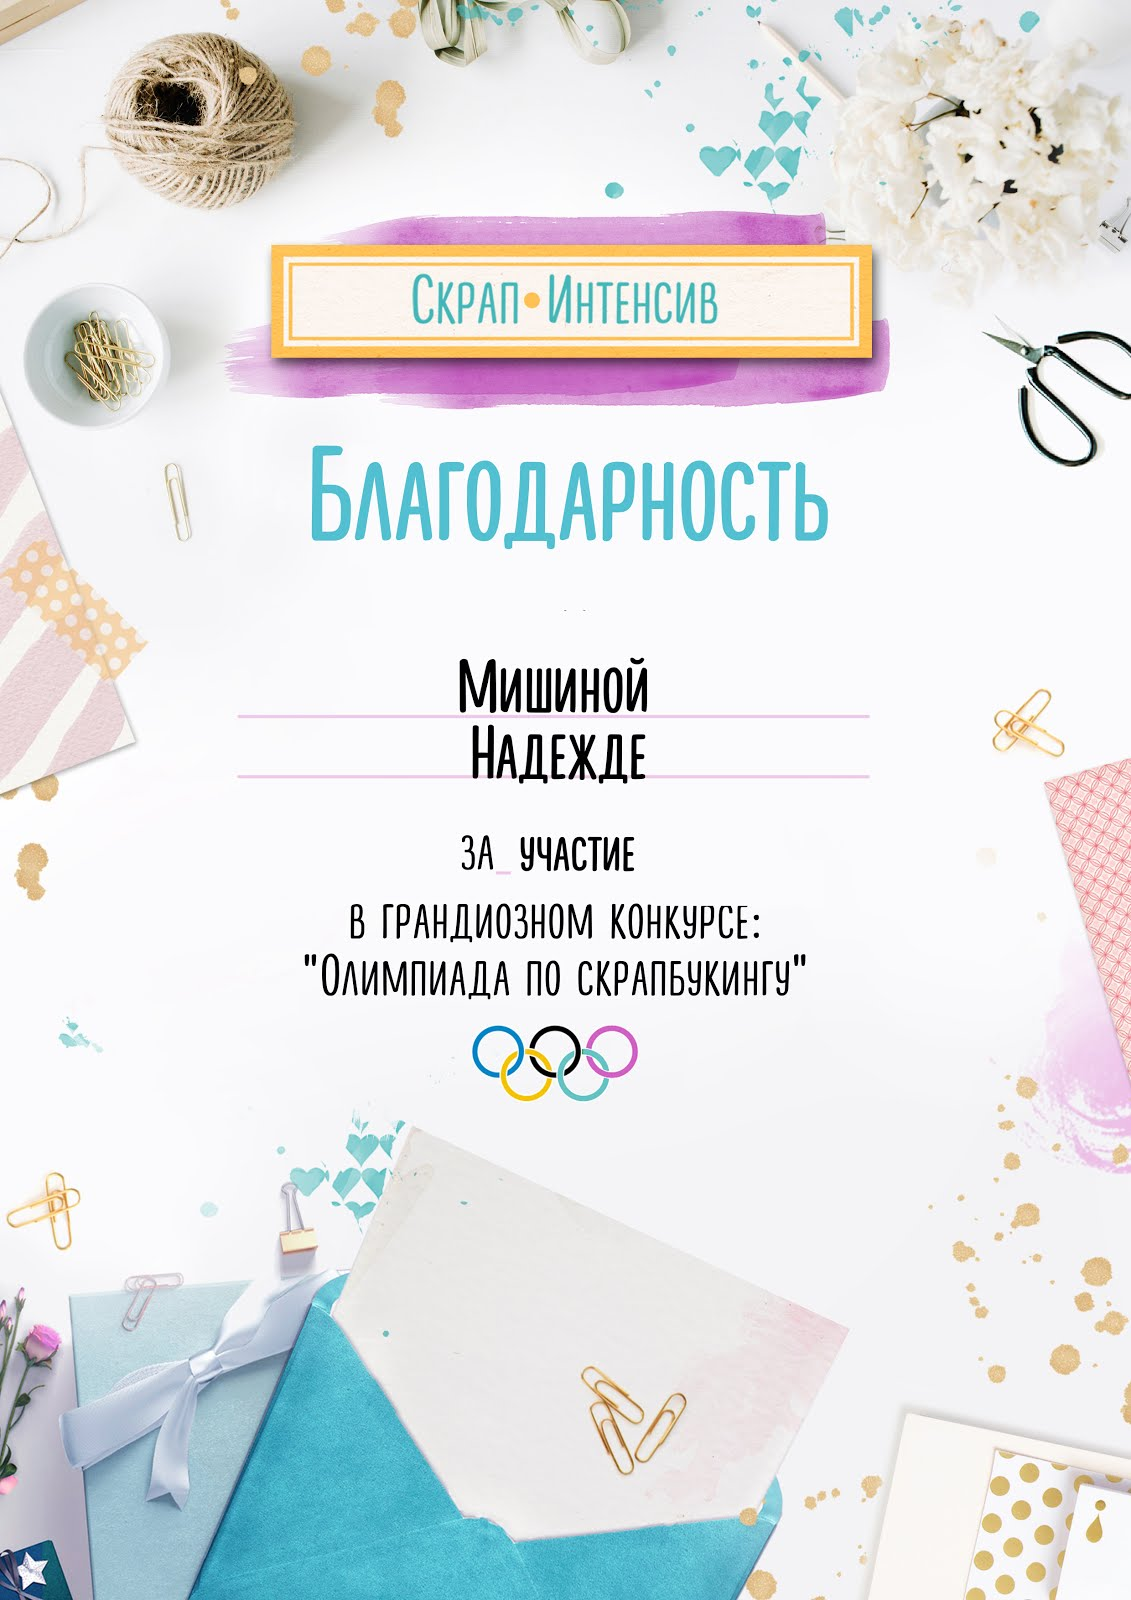 Олимпиада по Скрапбукингу